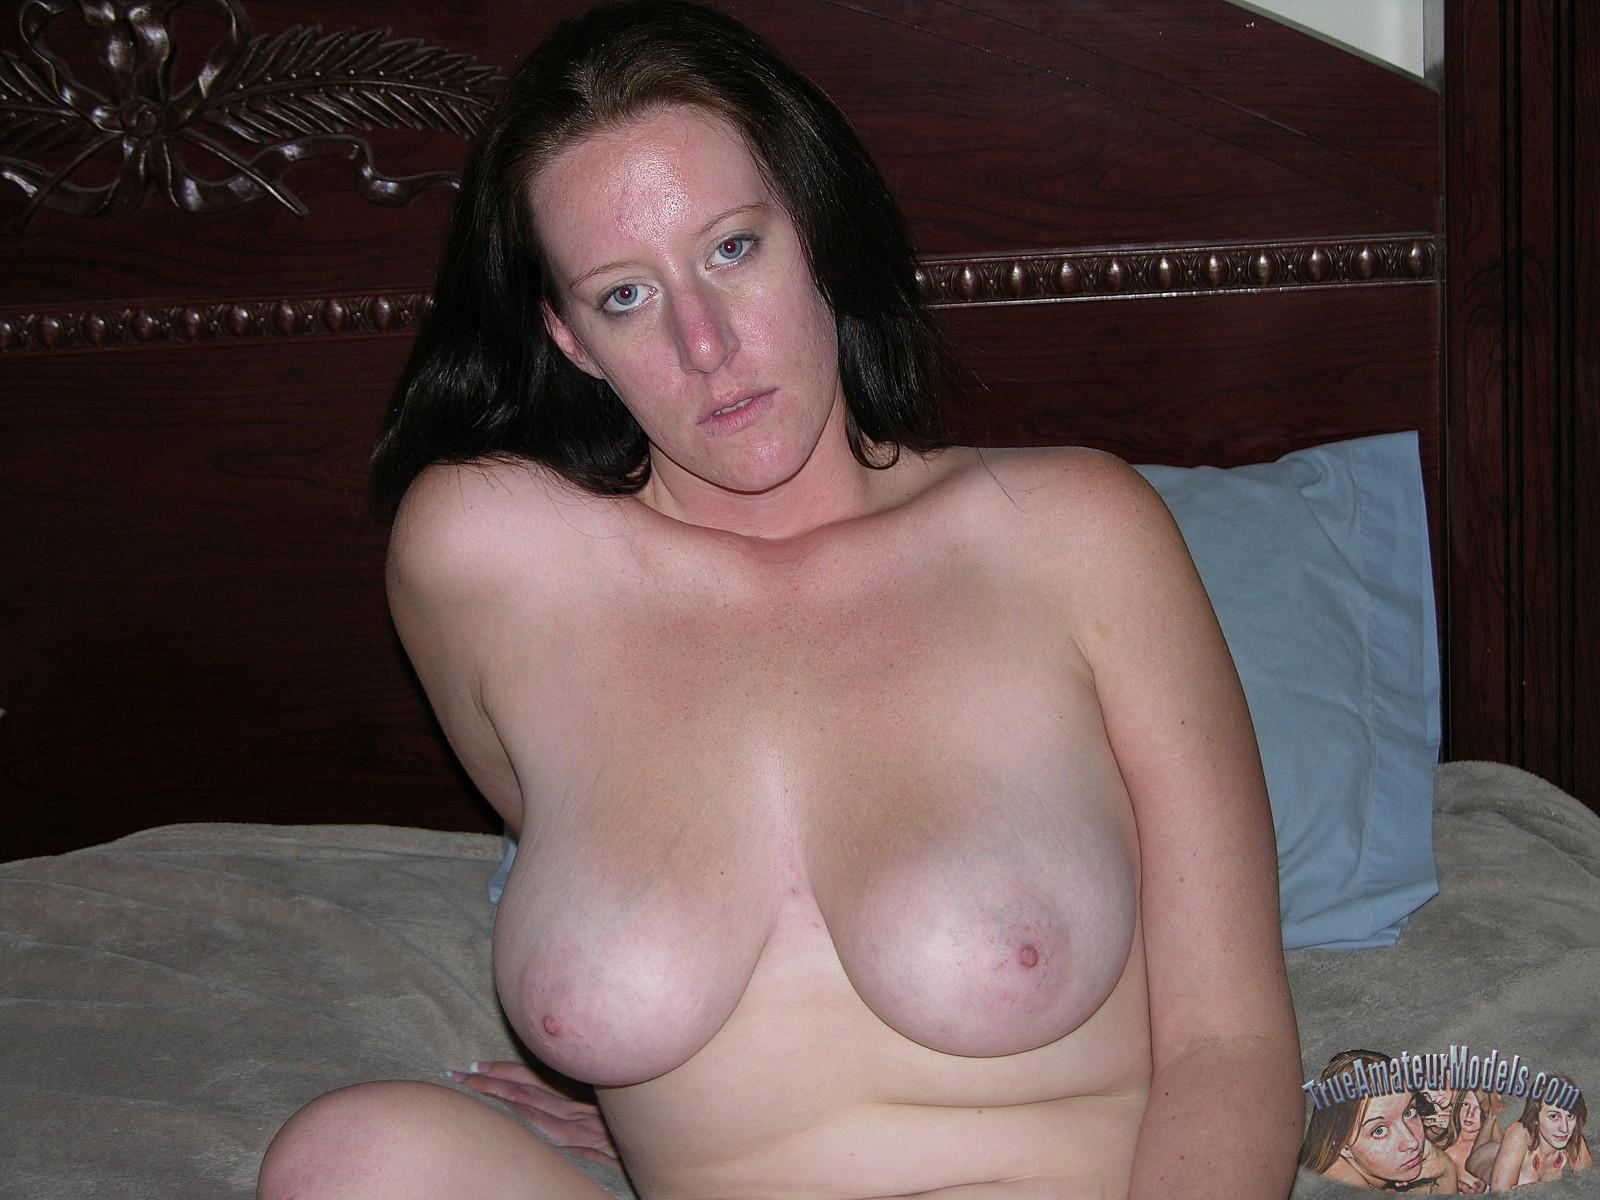 Models true nude amateur mature